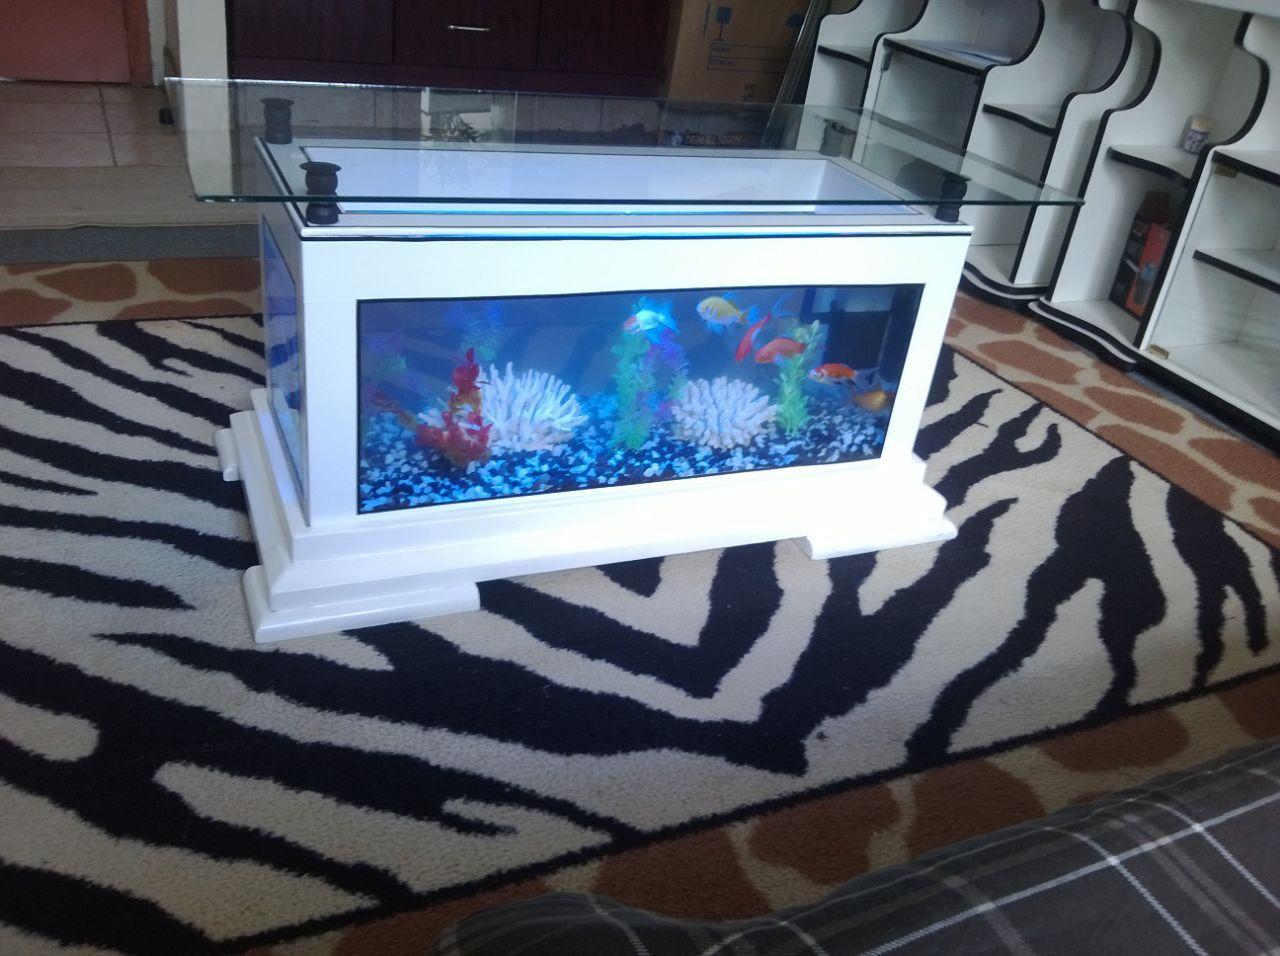 Coffee table aquariums wall mounted aquariums in kenya coffee table aquariums geotapseo Image collections